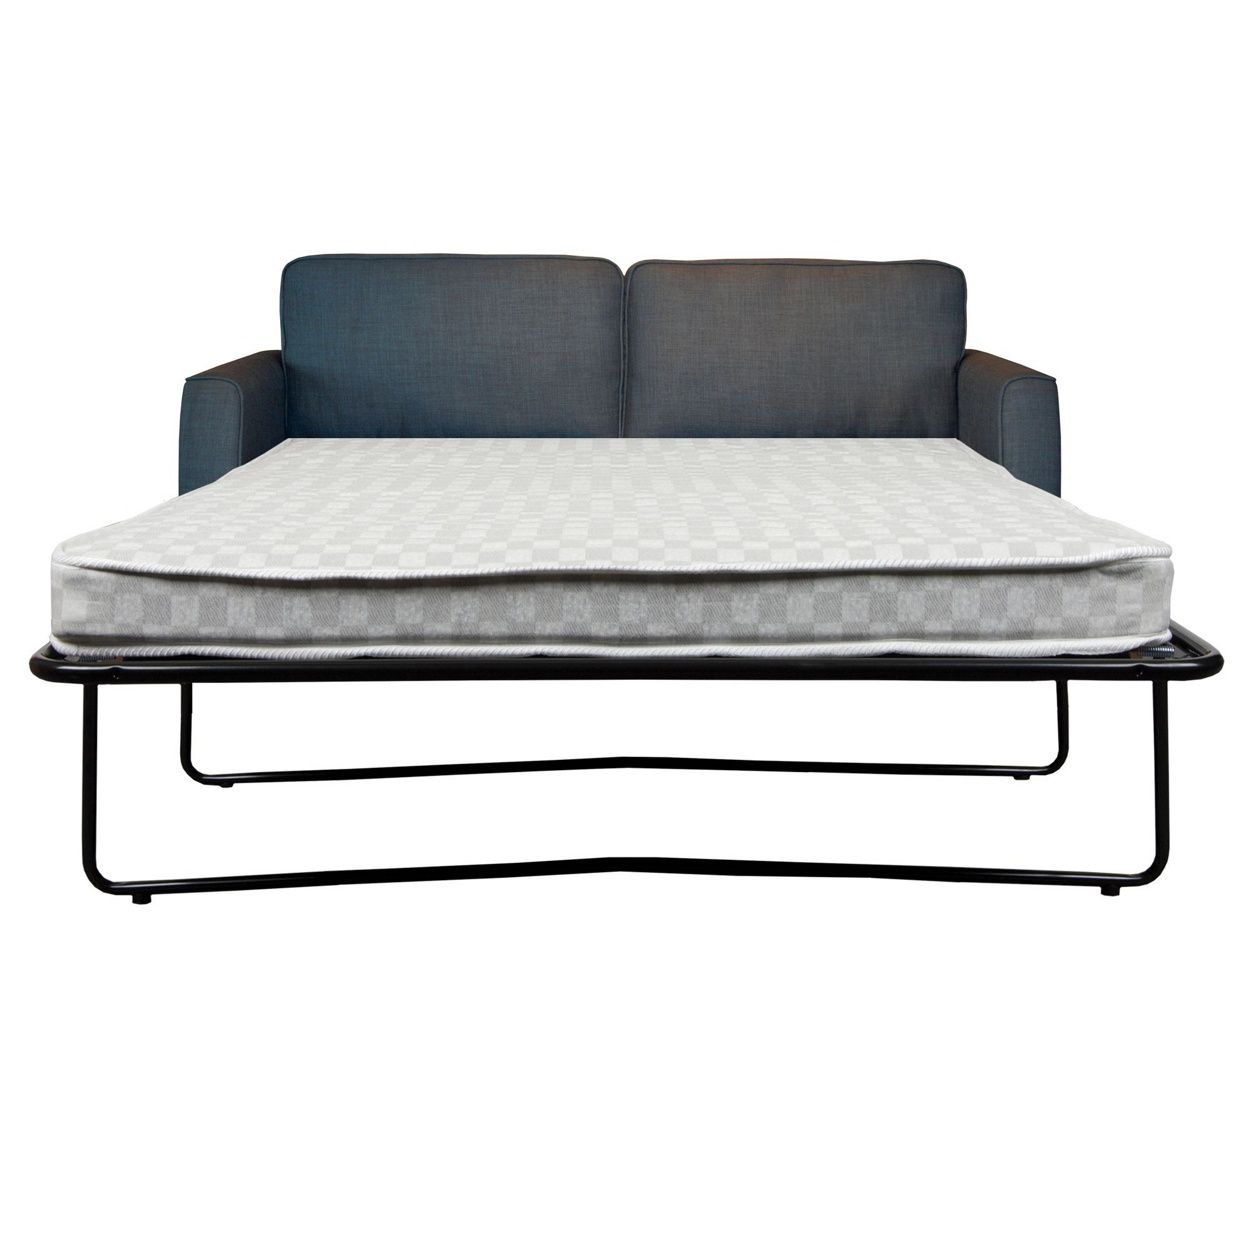 Superb Debenhams Dante Sofa Bed At Debenhams Com Sofa Beds Alphanode Cool Chair Designs And Ideas Alphanodeonline